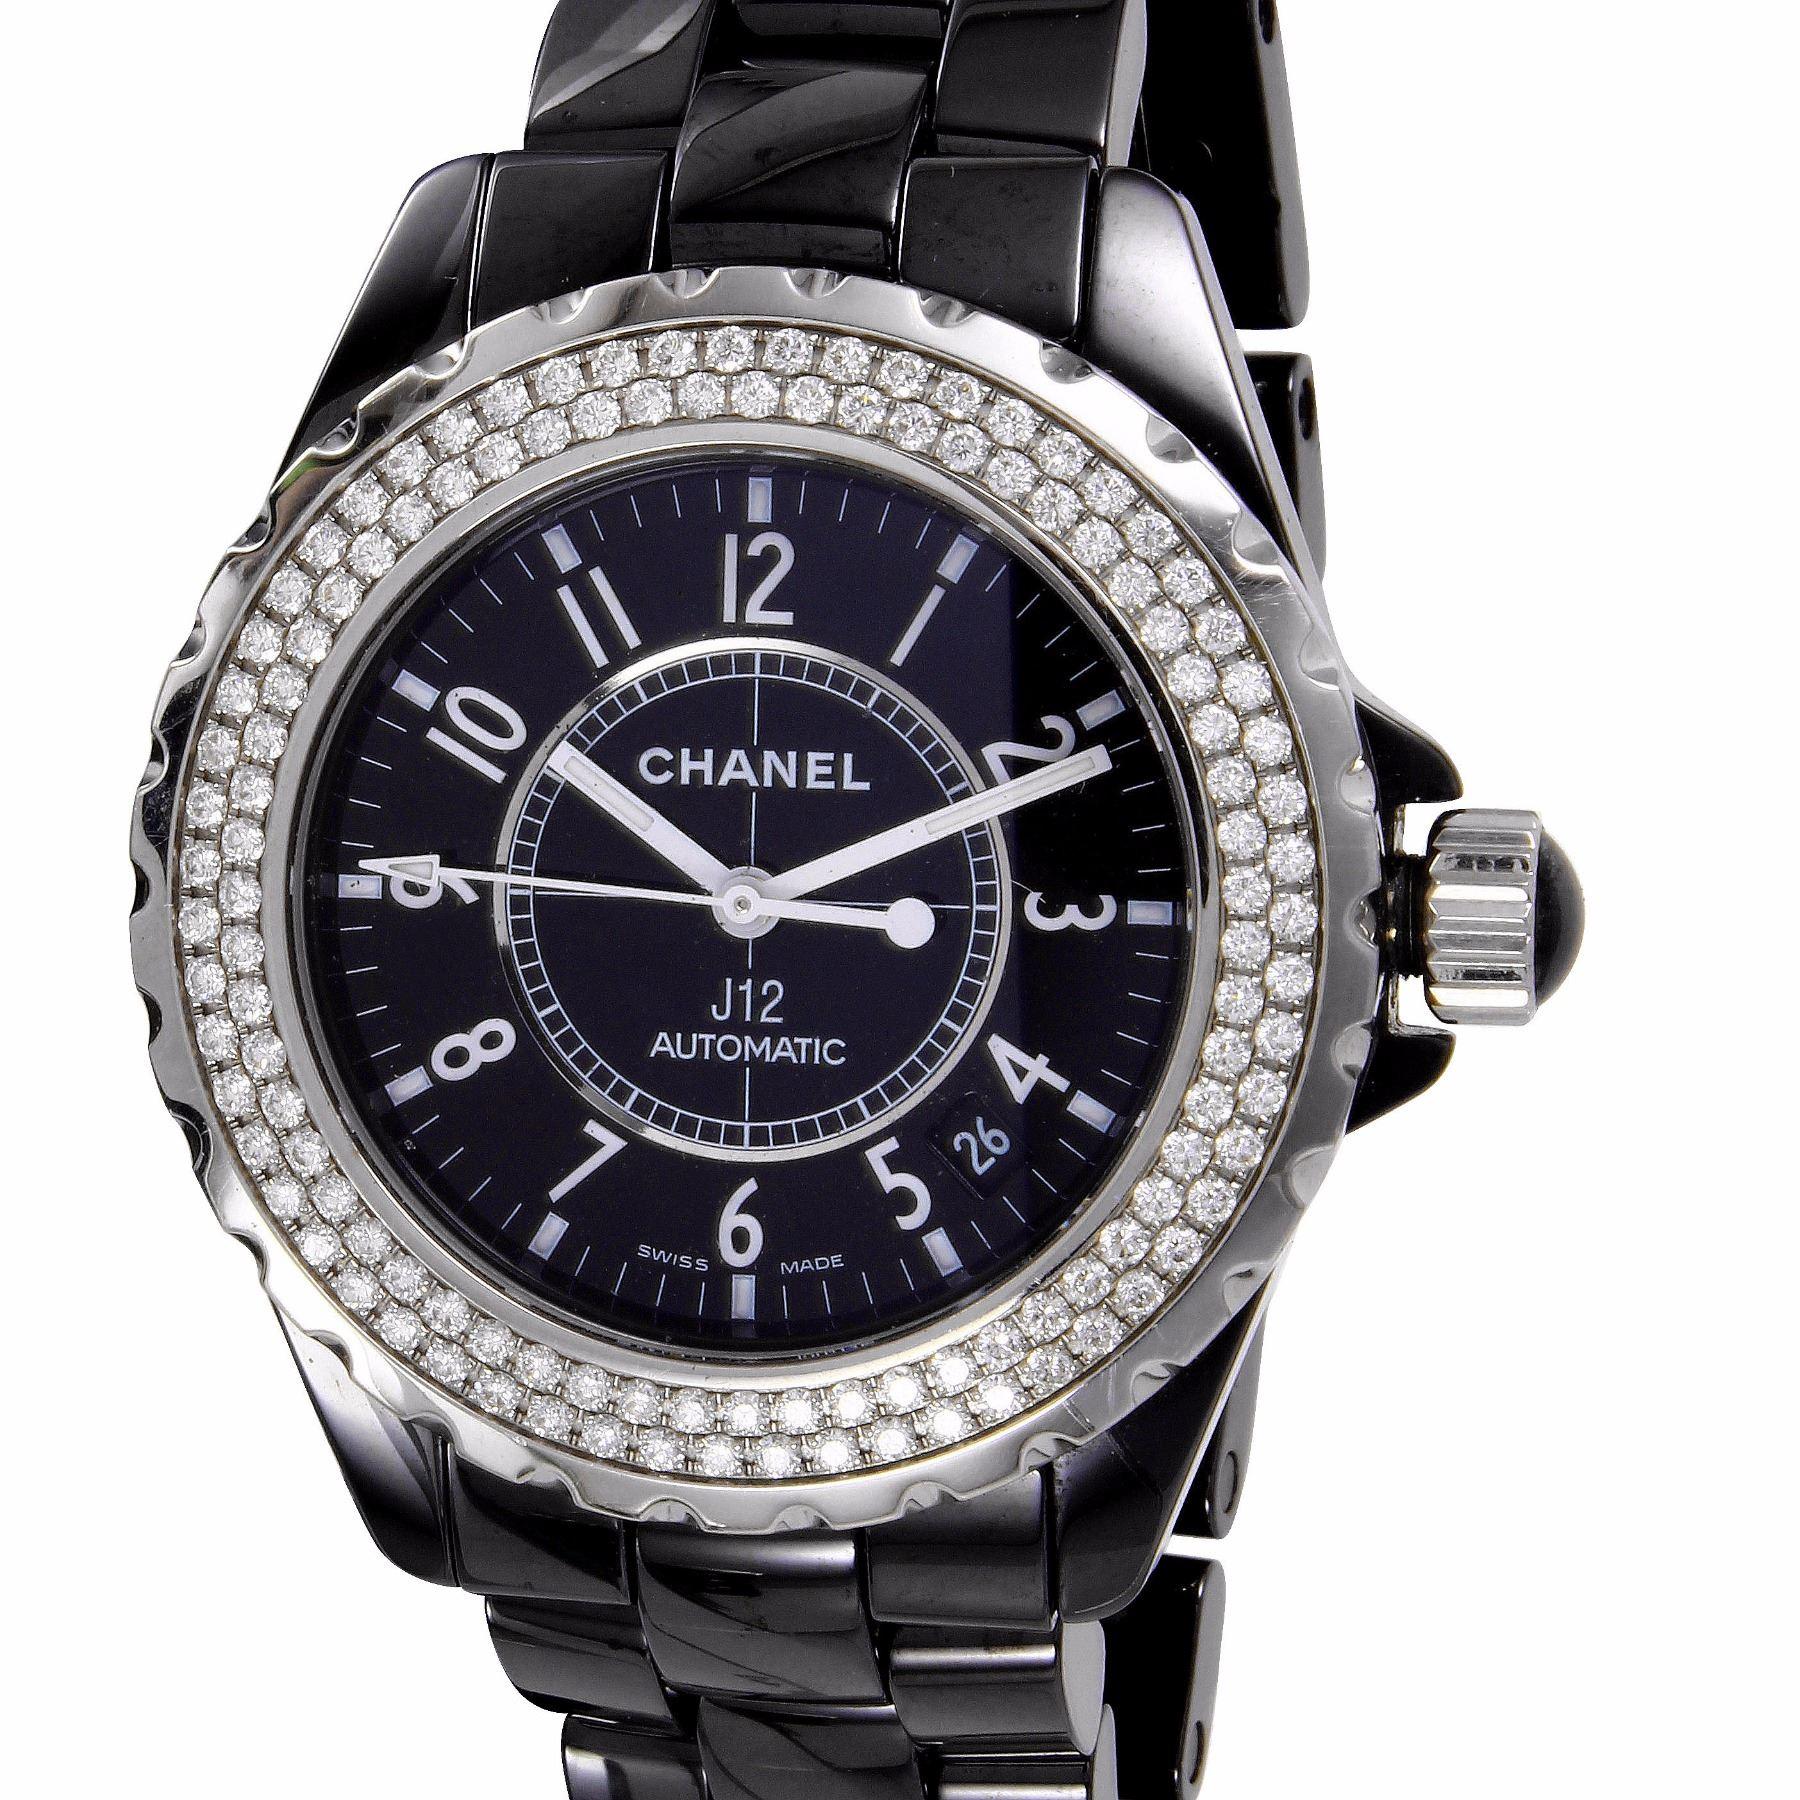 Chanel J12 Automatic Ceramic Diamond Watch 951